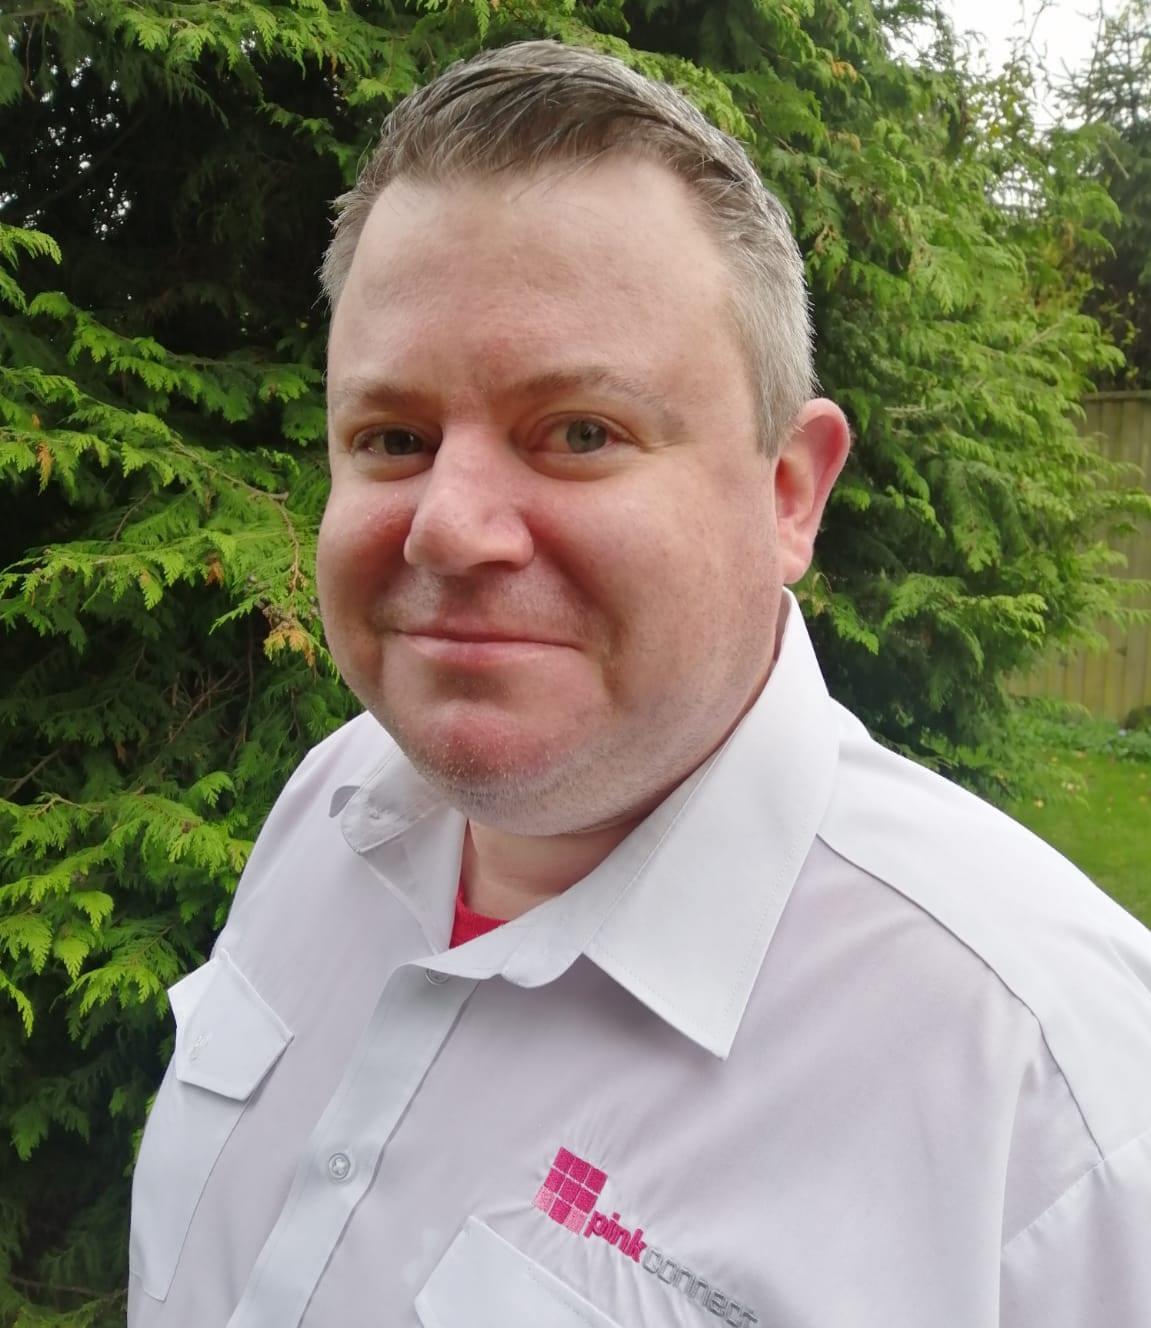 David Hartry